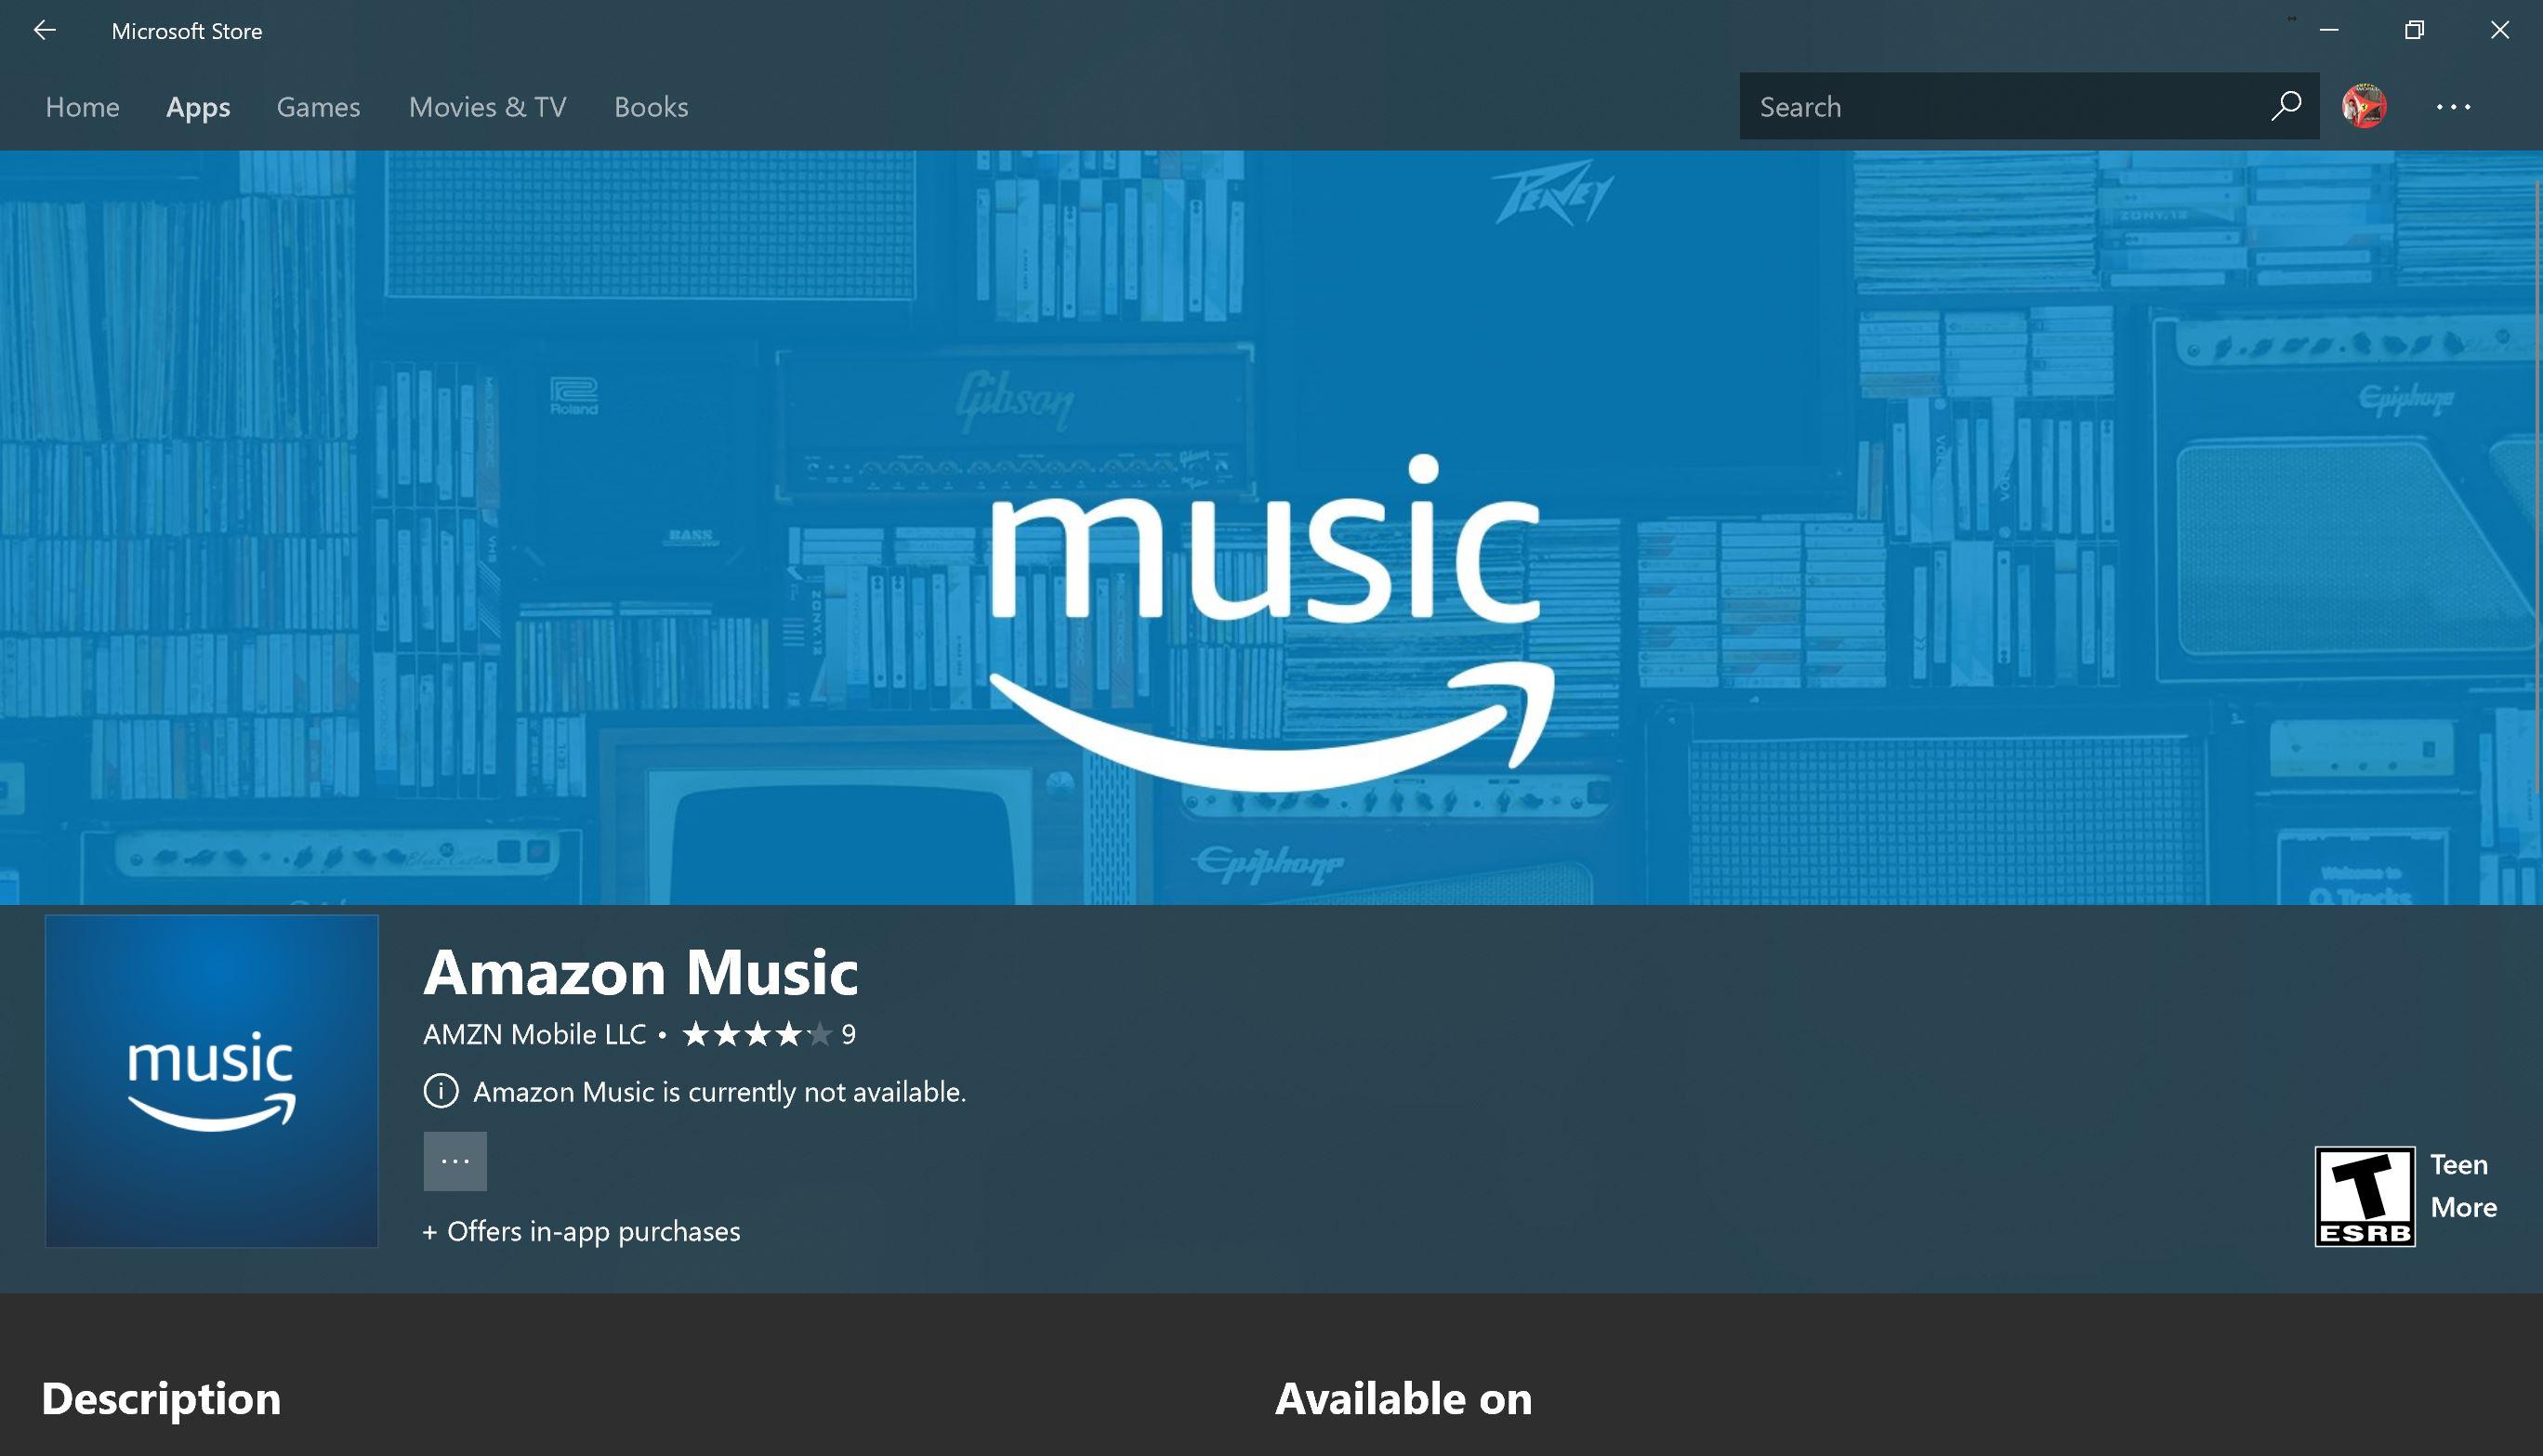 microsoft music store - Monza berglauf-verband com